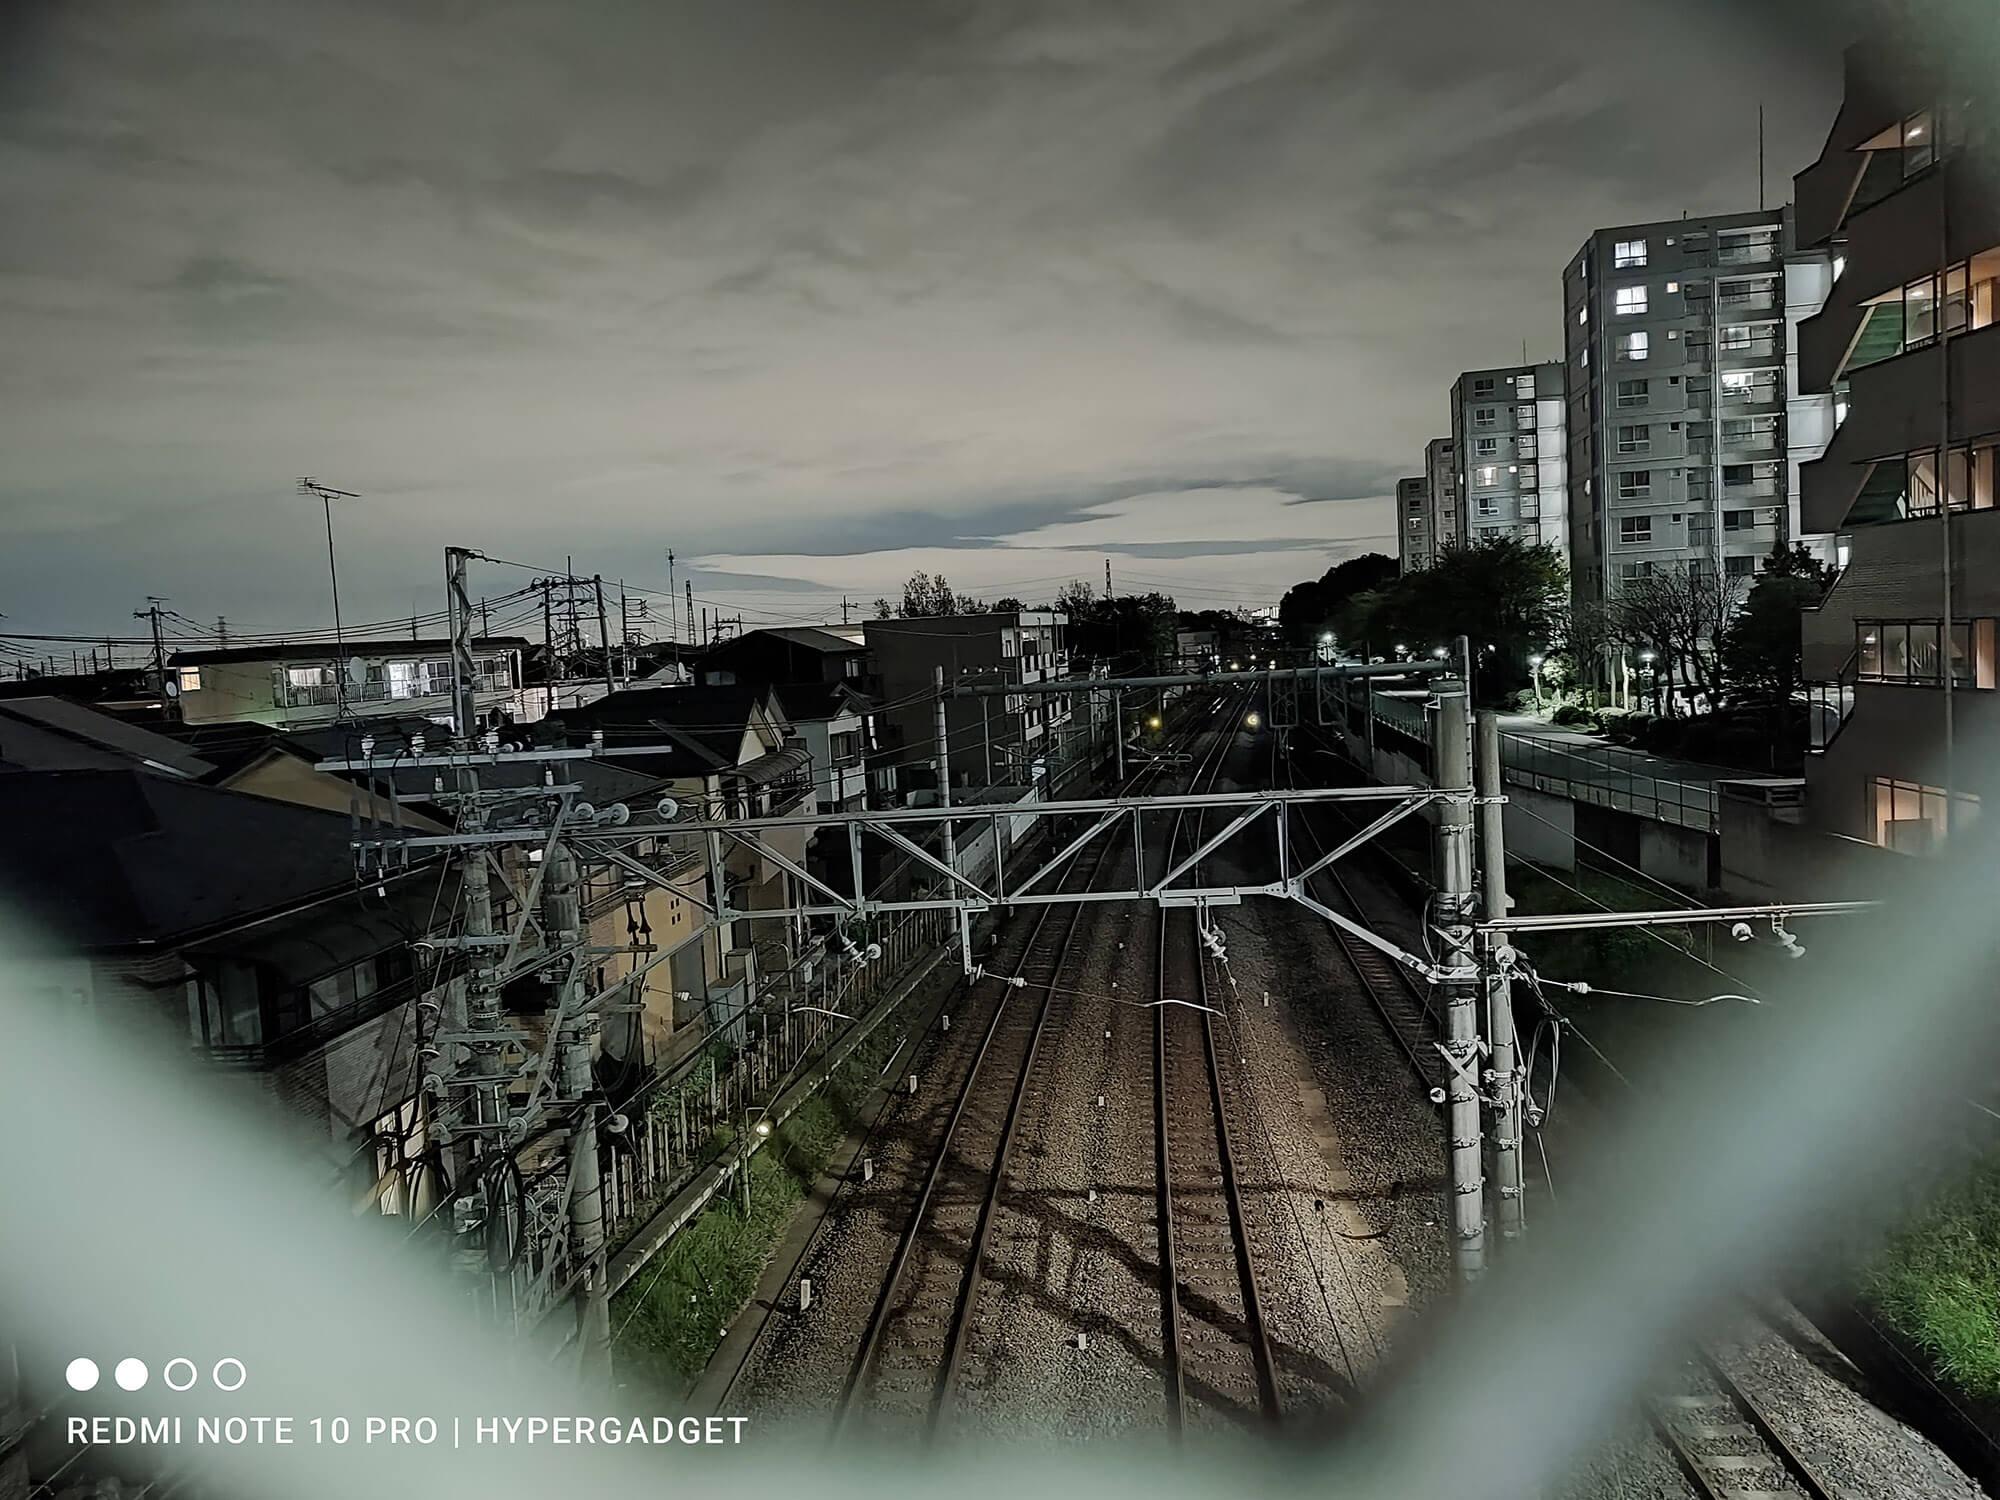 Redmi Note 10 ProのデフォルトカメラアプリはGCamを使わなくてもノイズレスで高画質